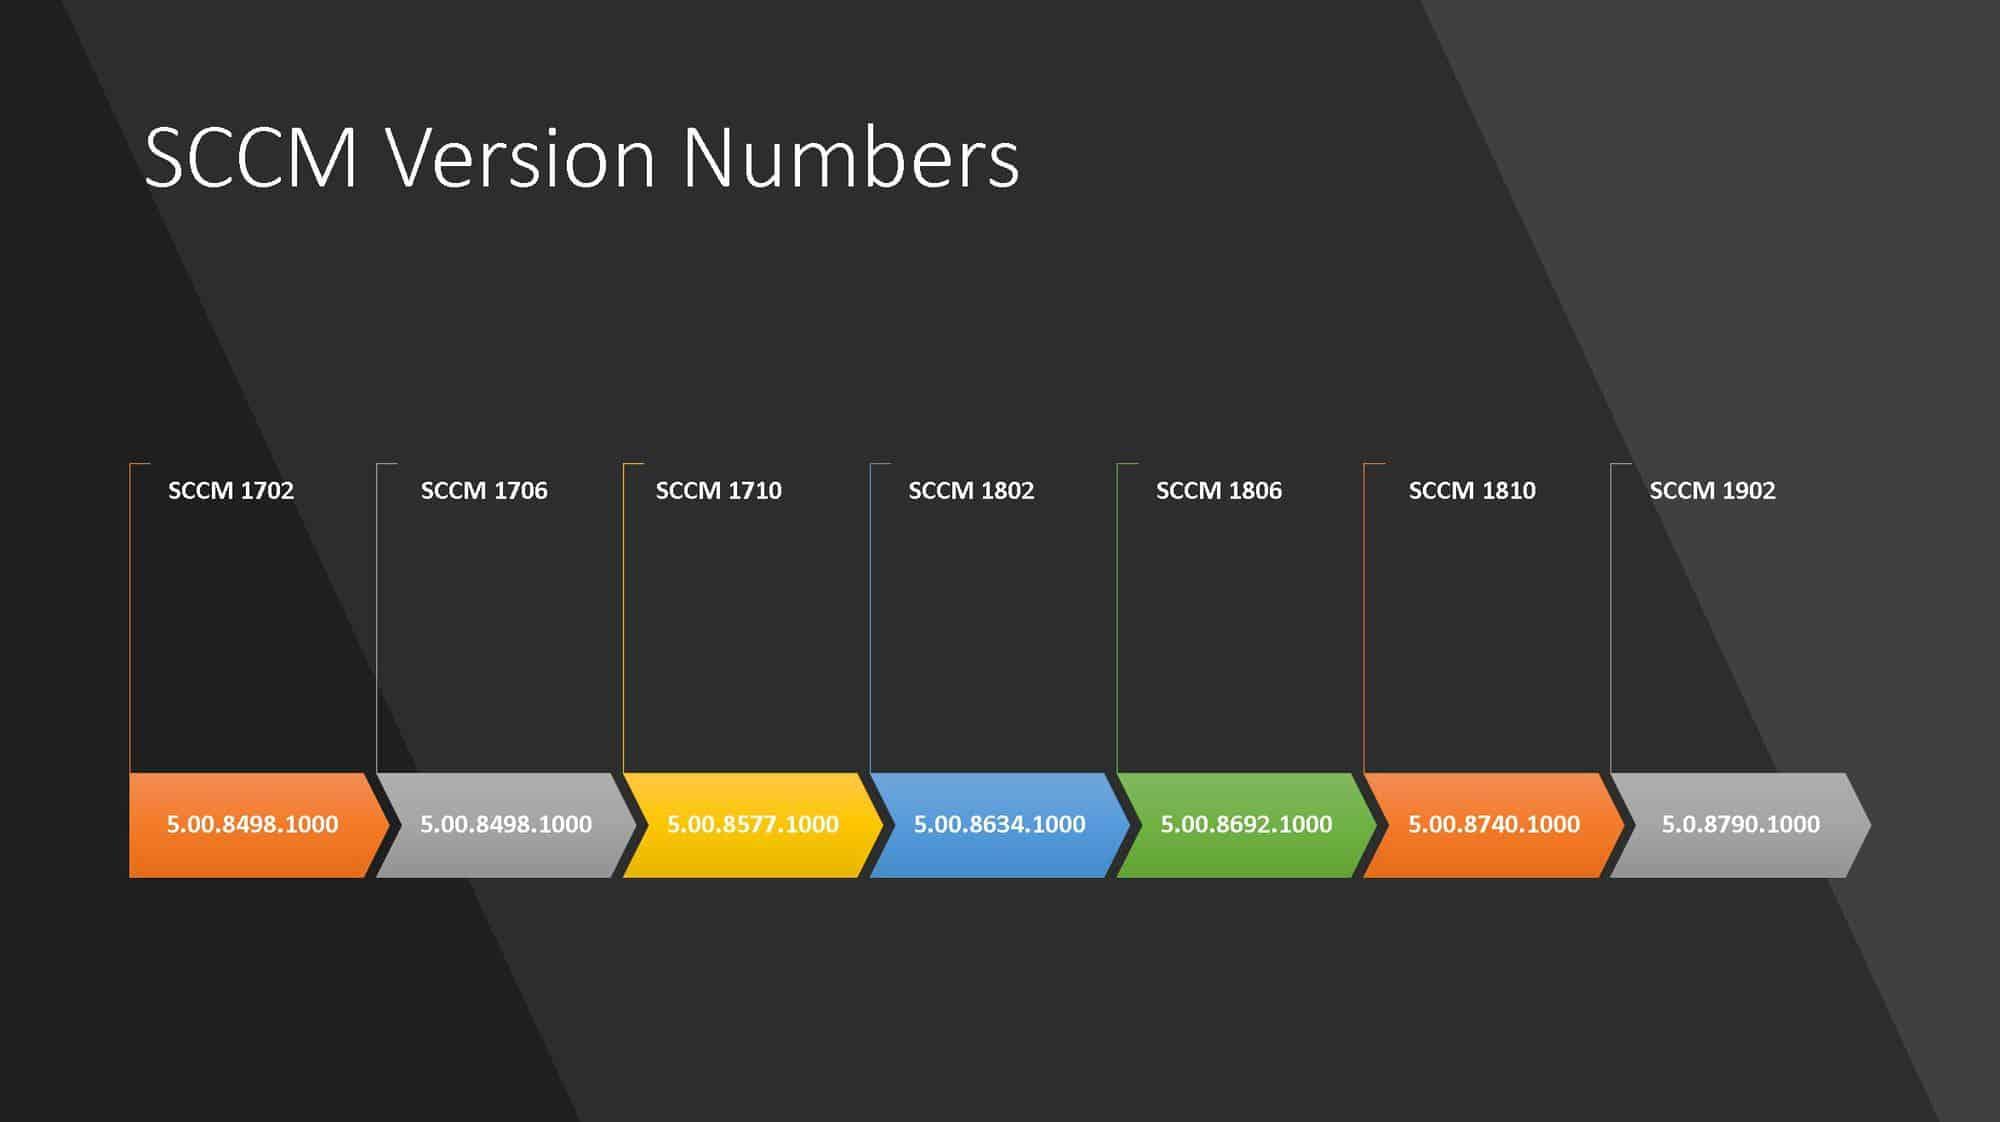 SCCM Version Numbers SCCM Client Versions Numbers